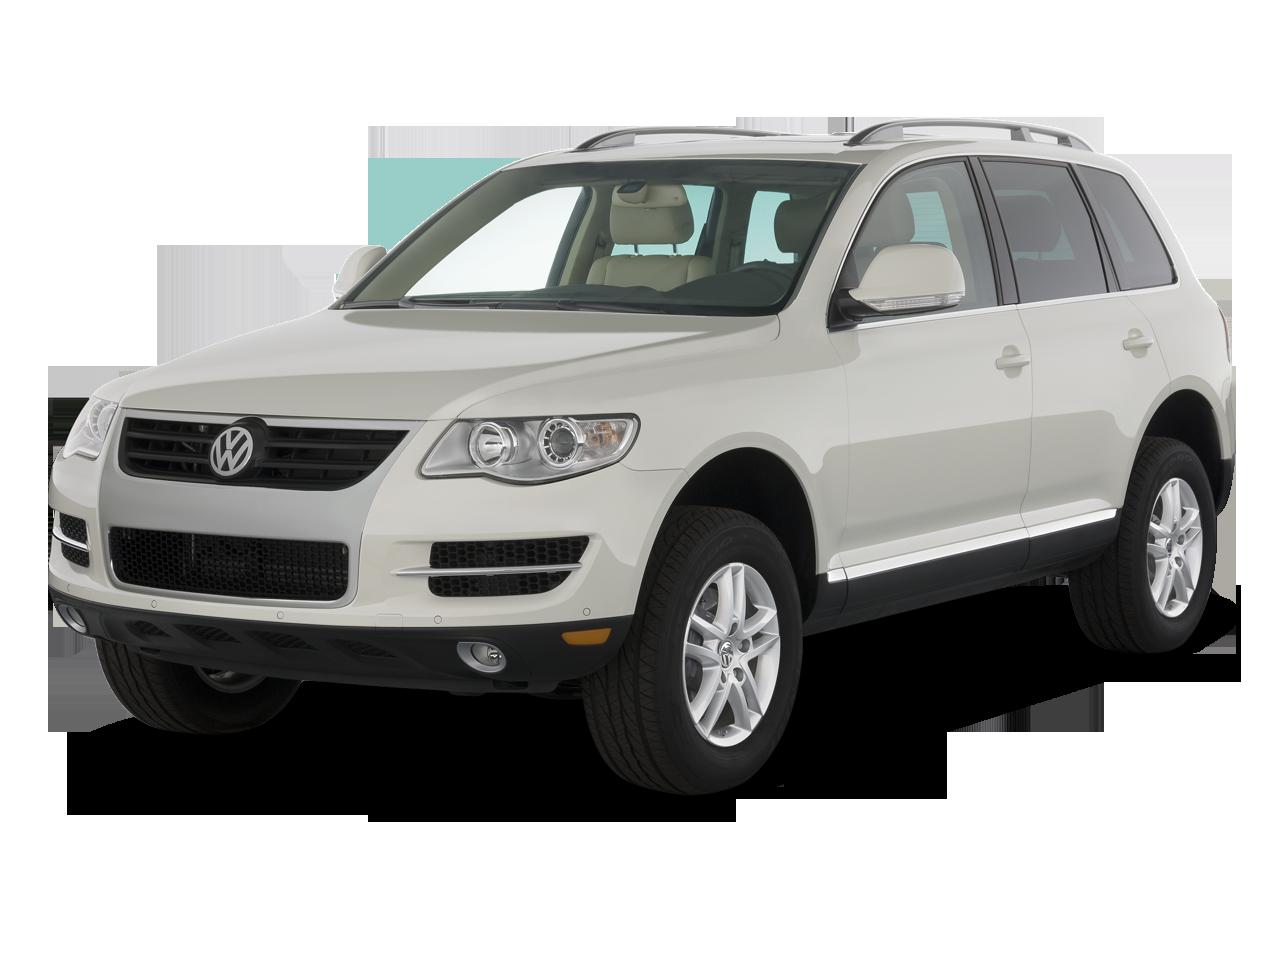 Лобовое стекло Volkswagen Touareg с местом под датчик (2002-2010)